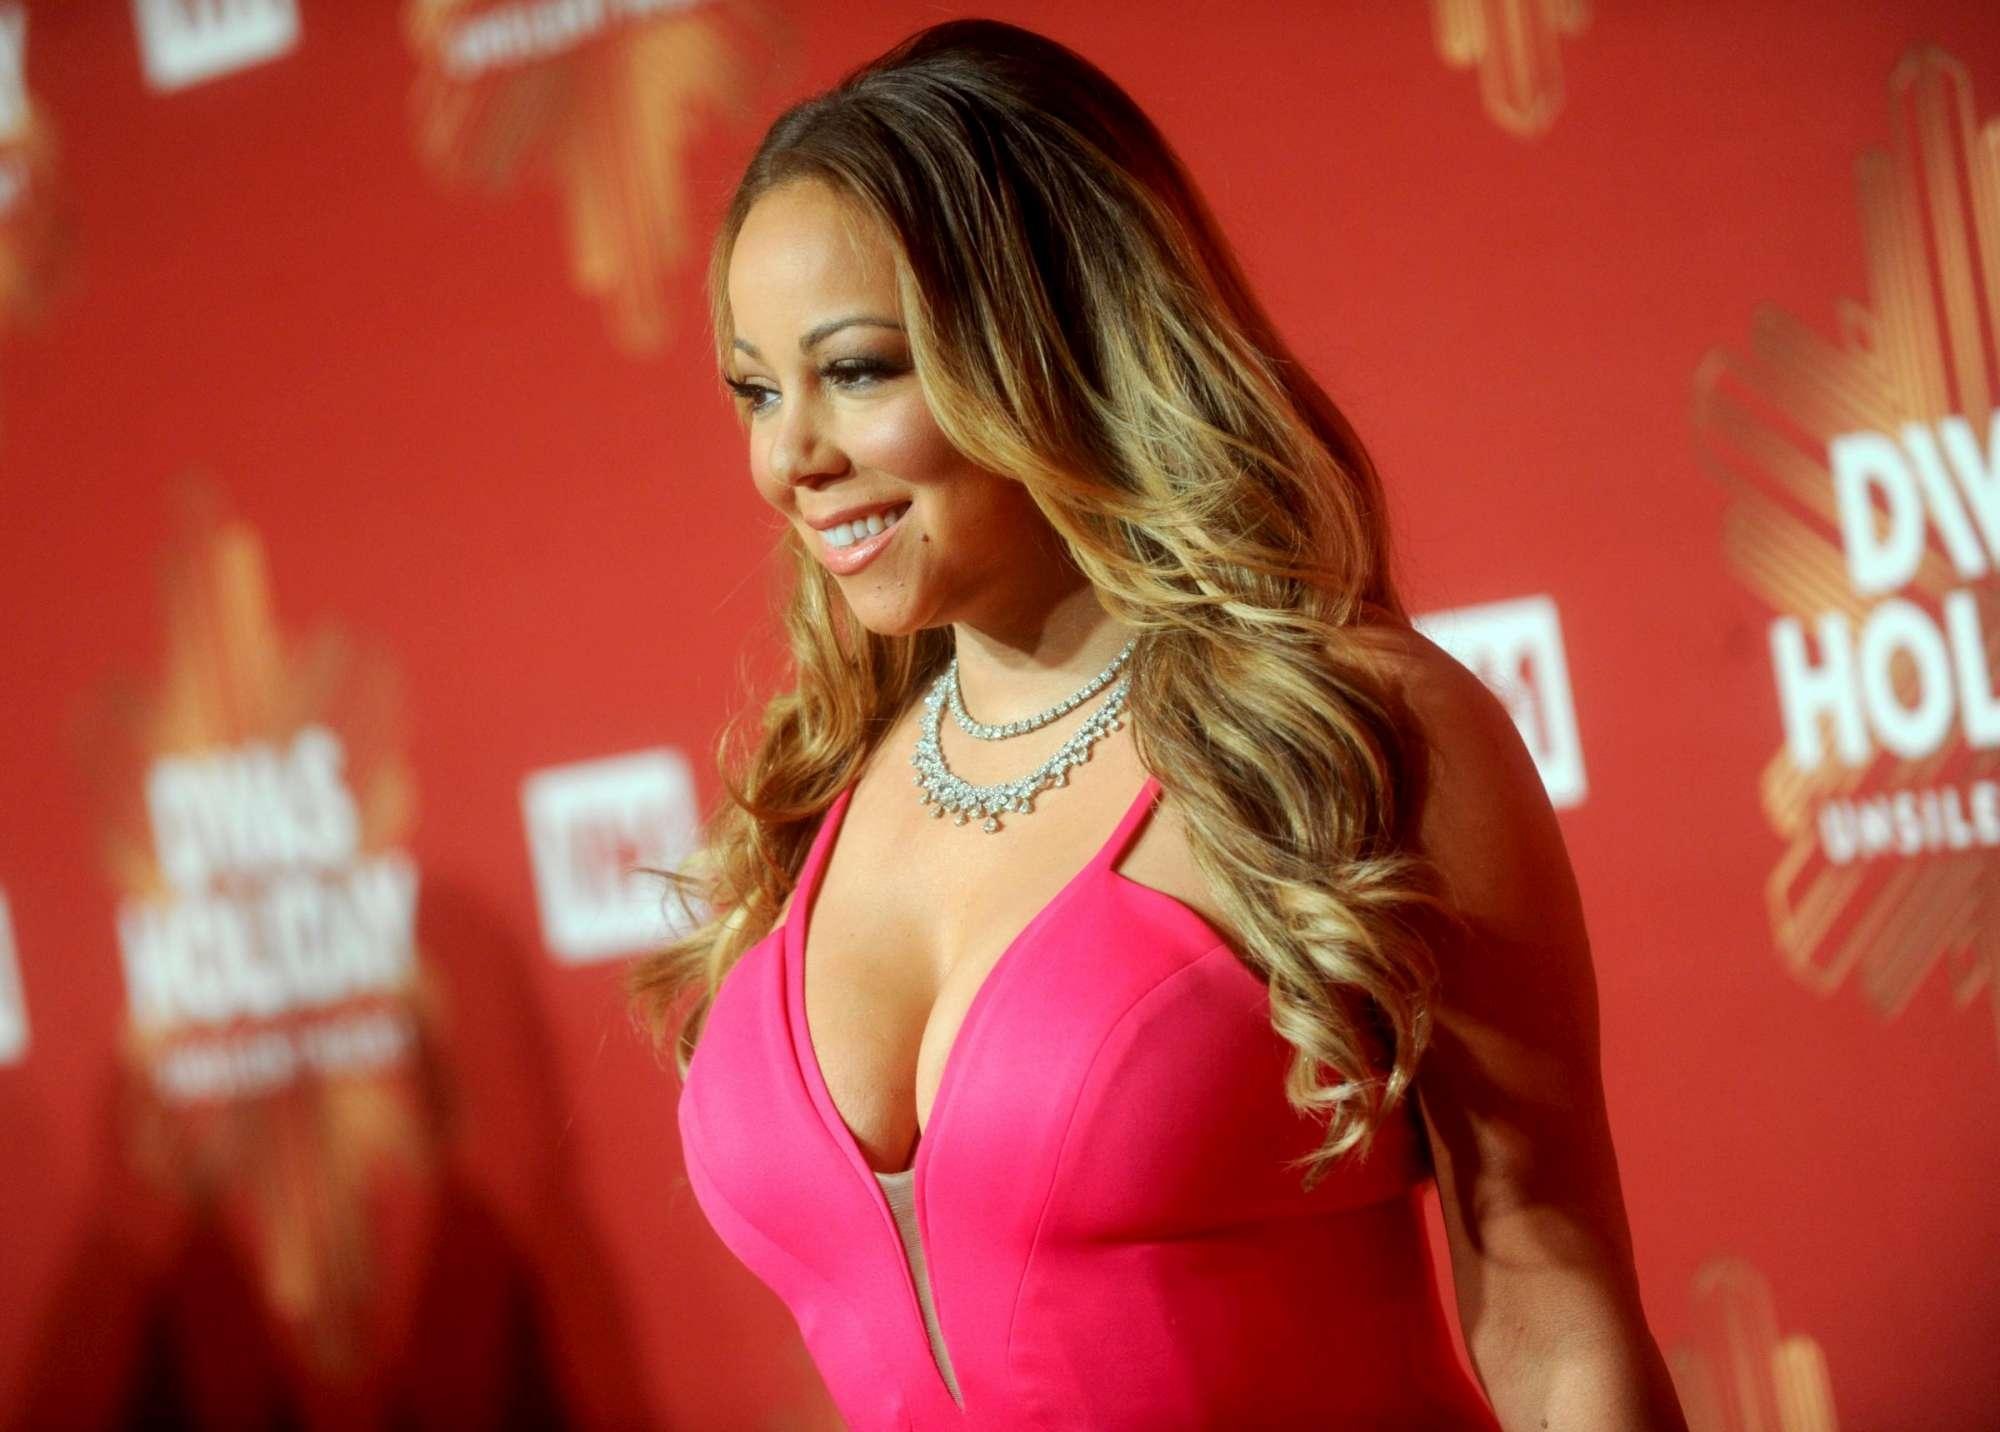 Mariah Carey, décolleté esplosivo sul red carpet